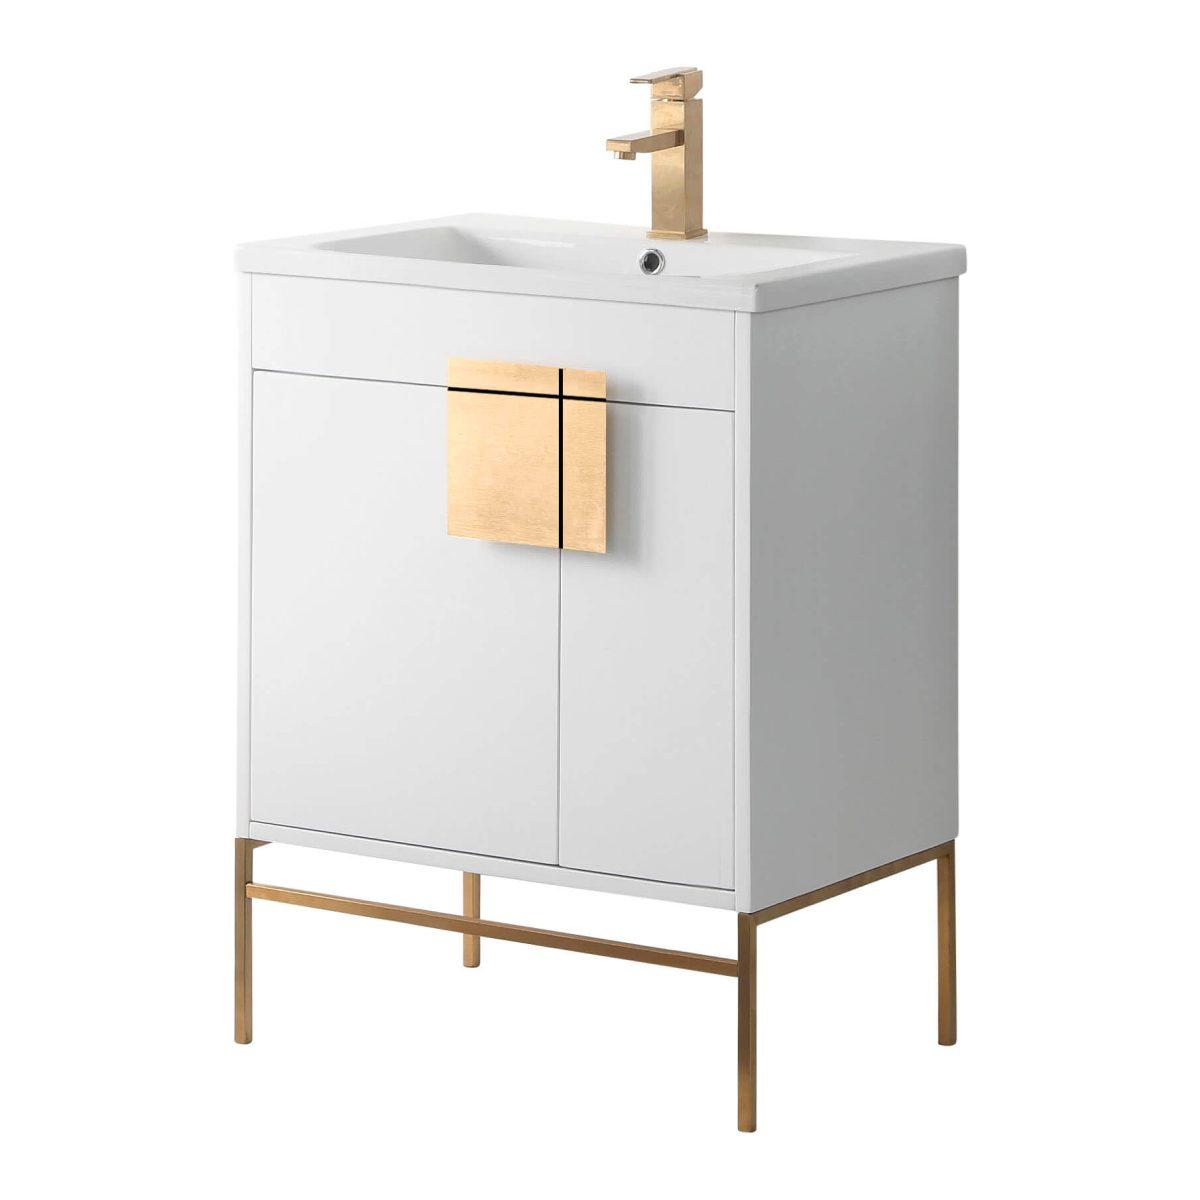 "Shawbridge 30"" Modern Bathroom Vanity  White with Satin Brass Hardware"